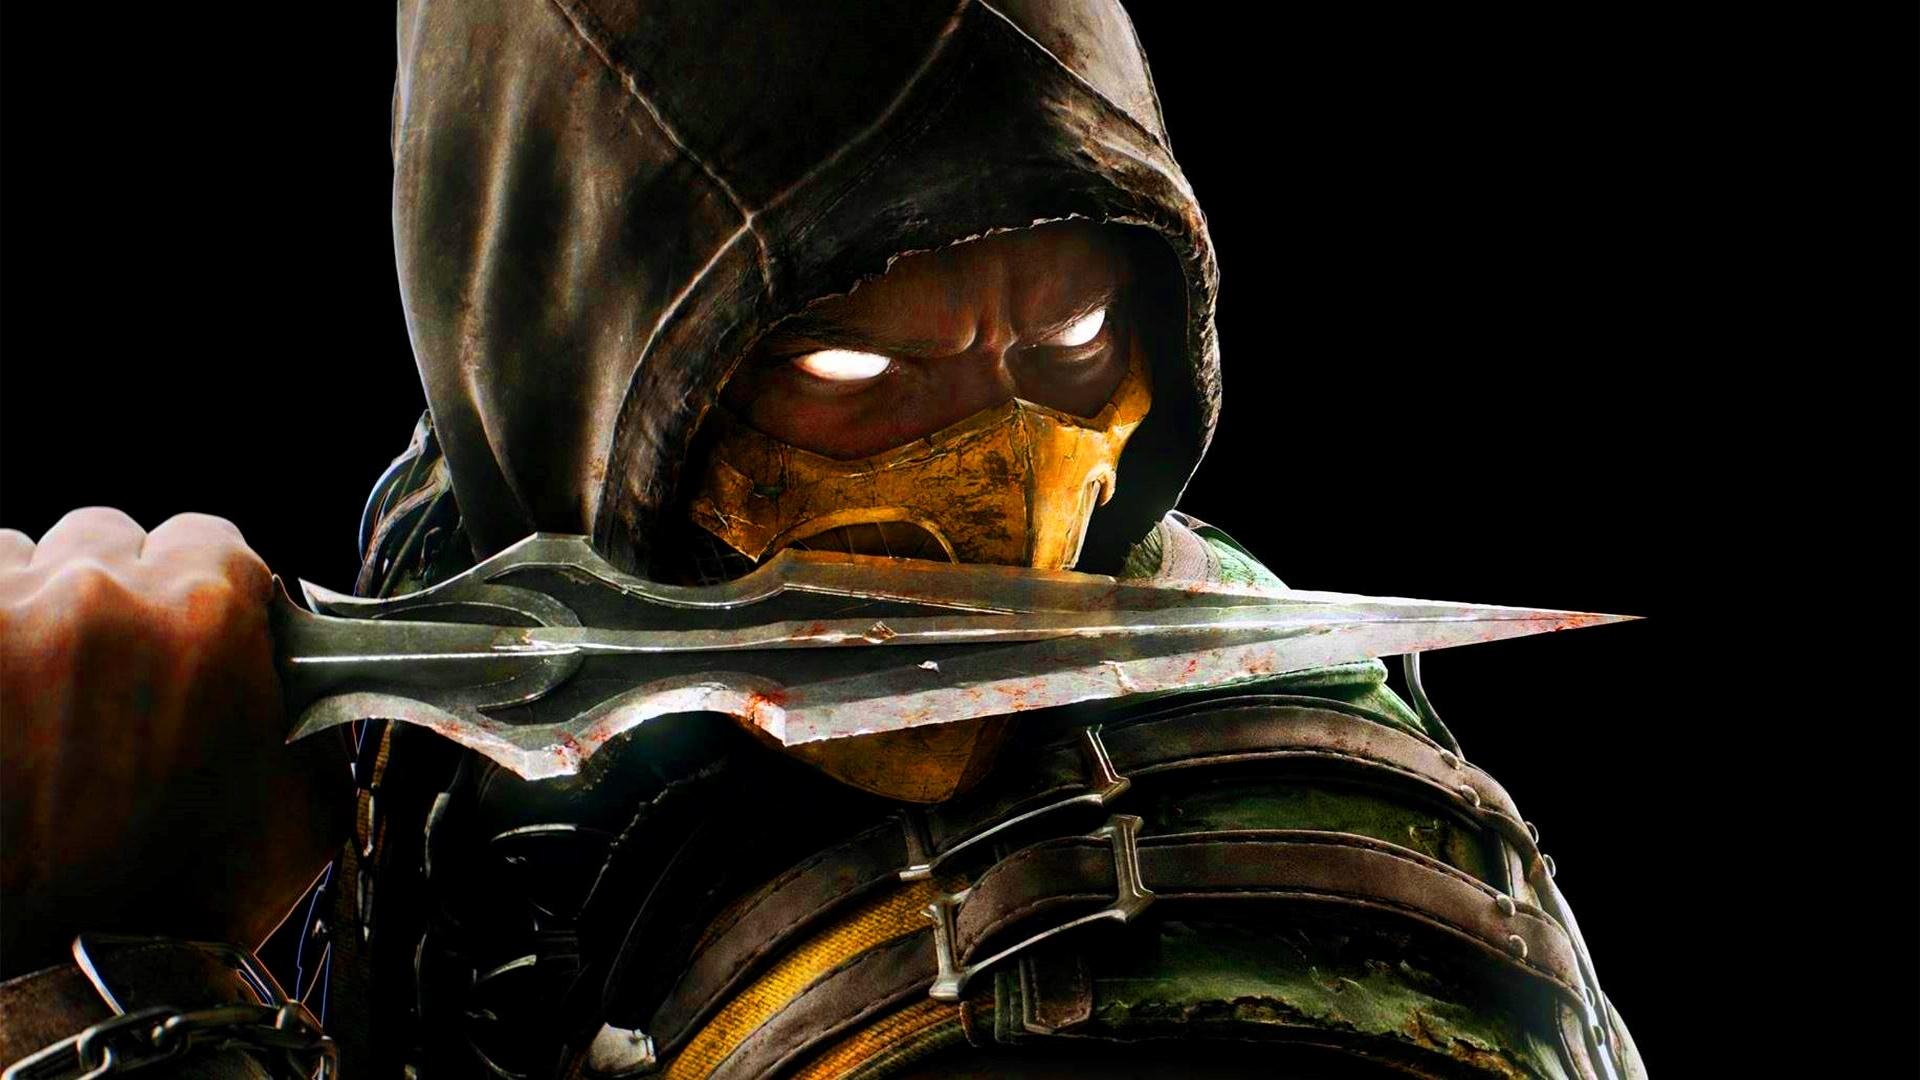 Mortal Kombat X Scorpion With Knife Wallpapers   1920x1080   421508 1920x1080